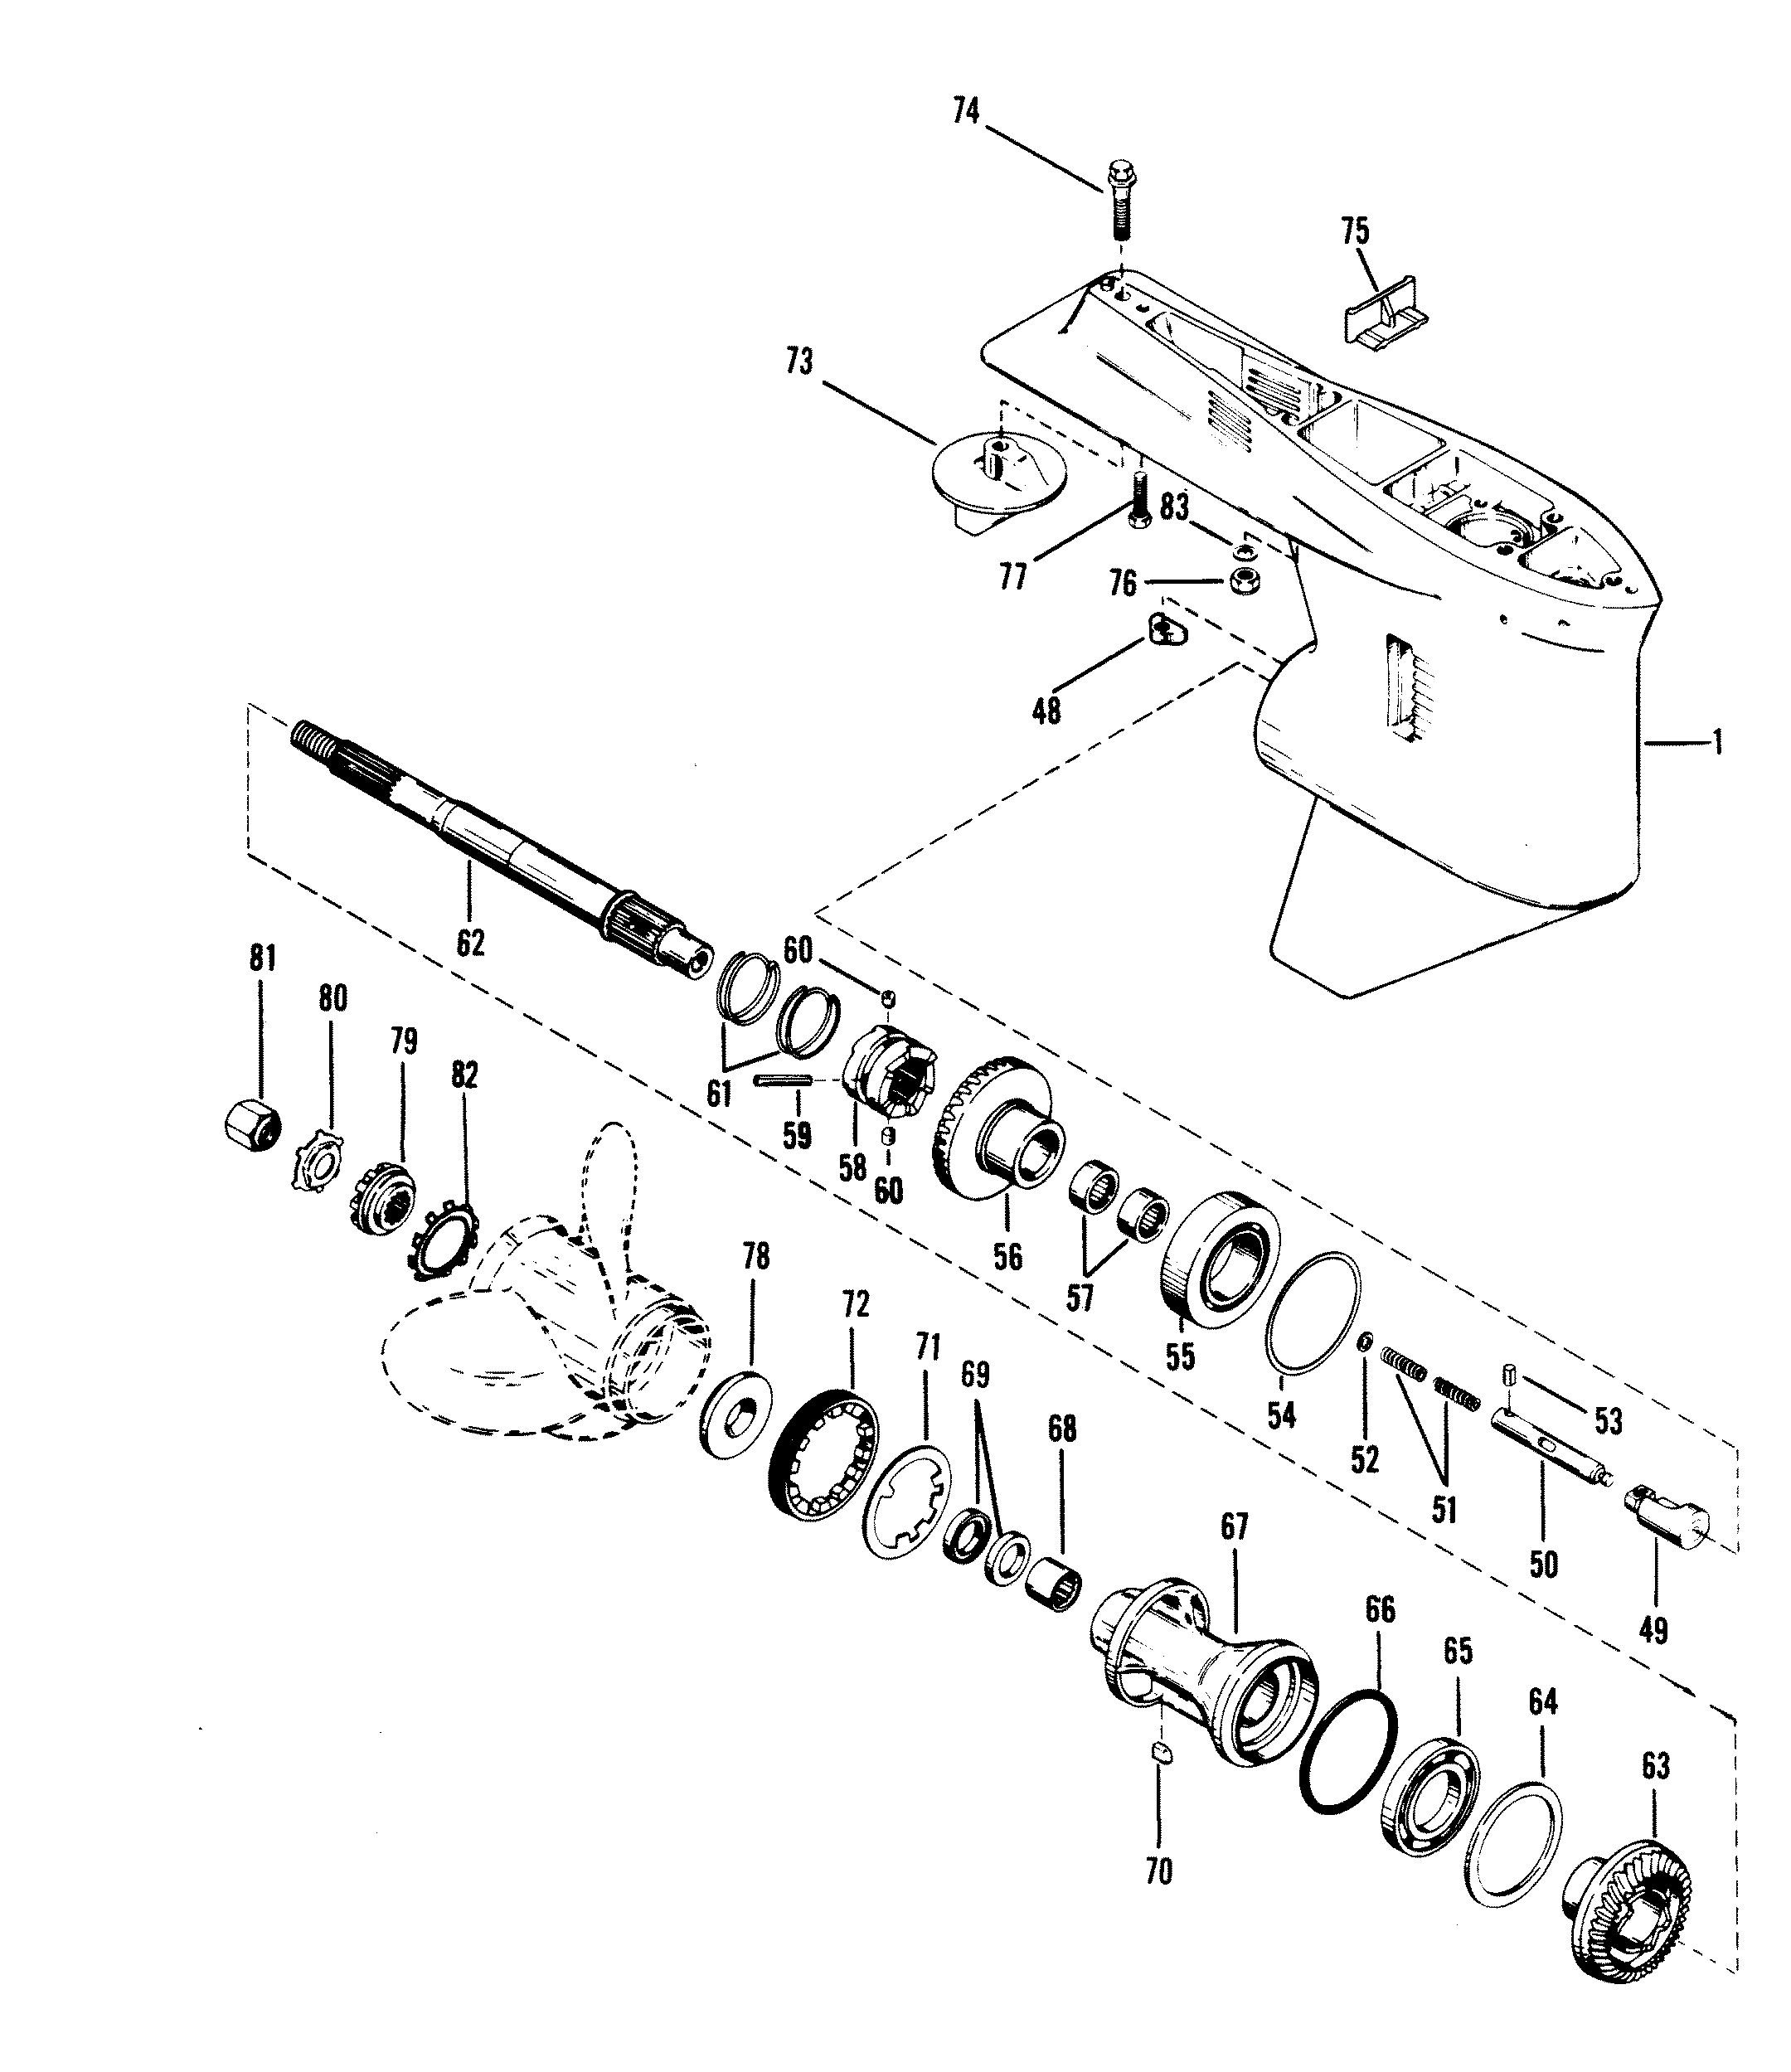 Mercury | MARINER | V-175 | 0C100861 THRU 0C239552 | GEAR